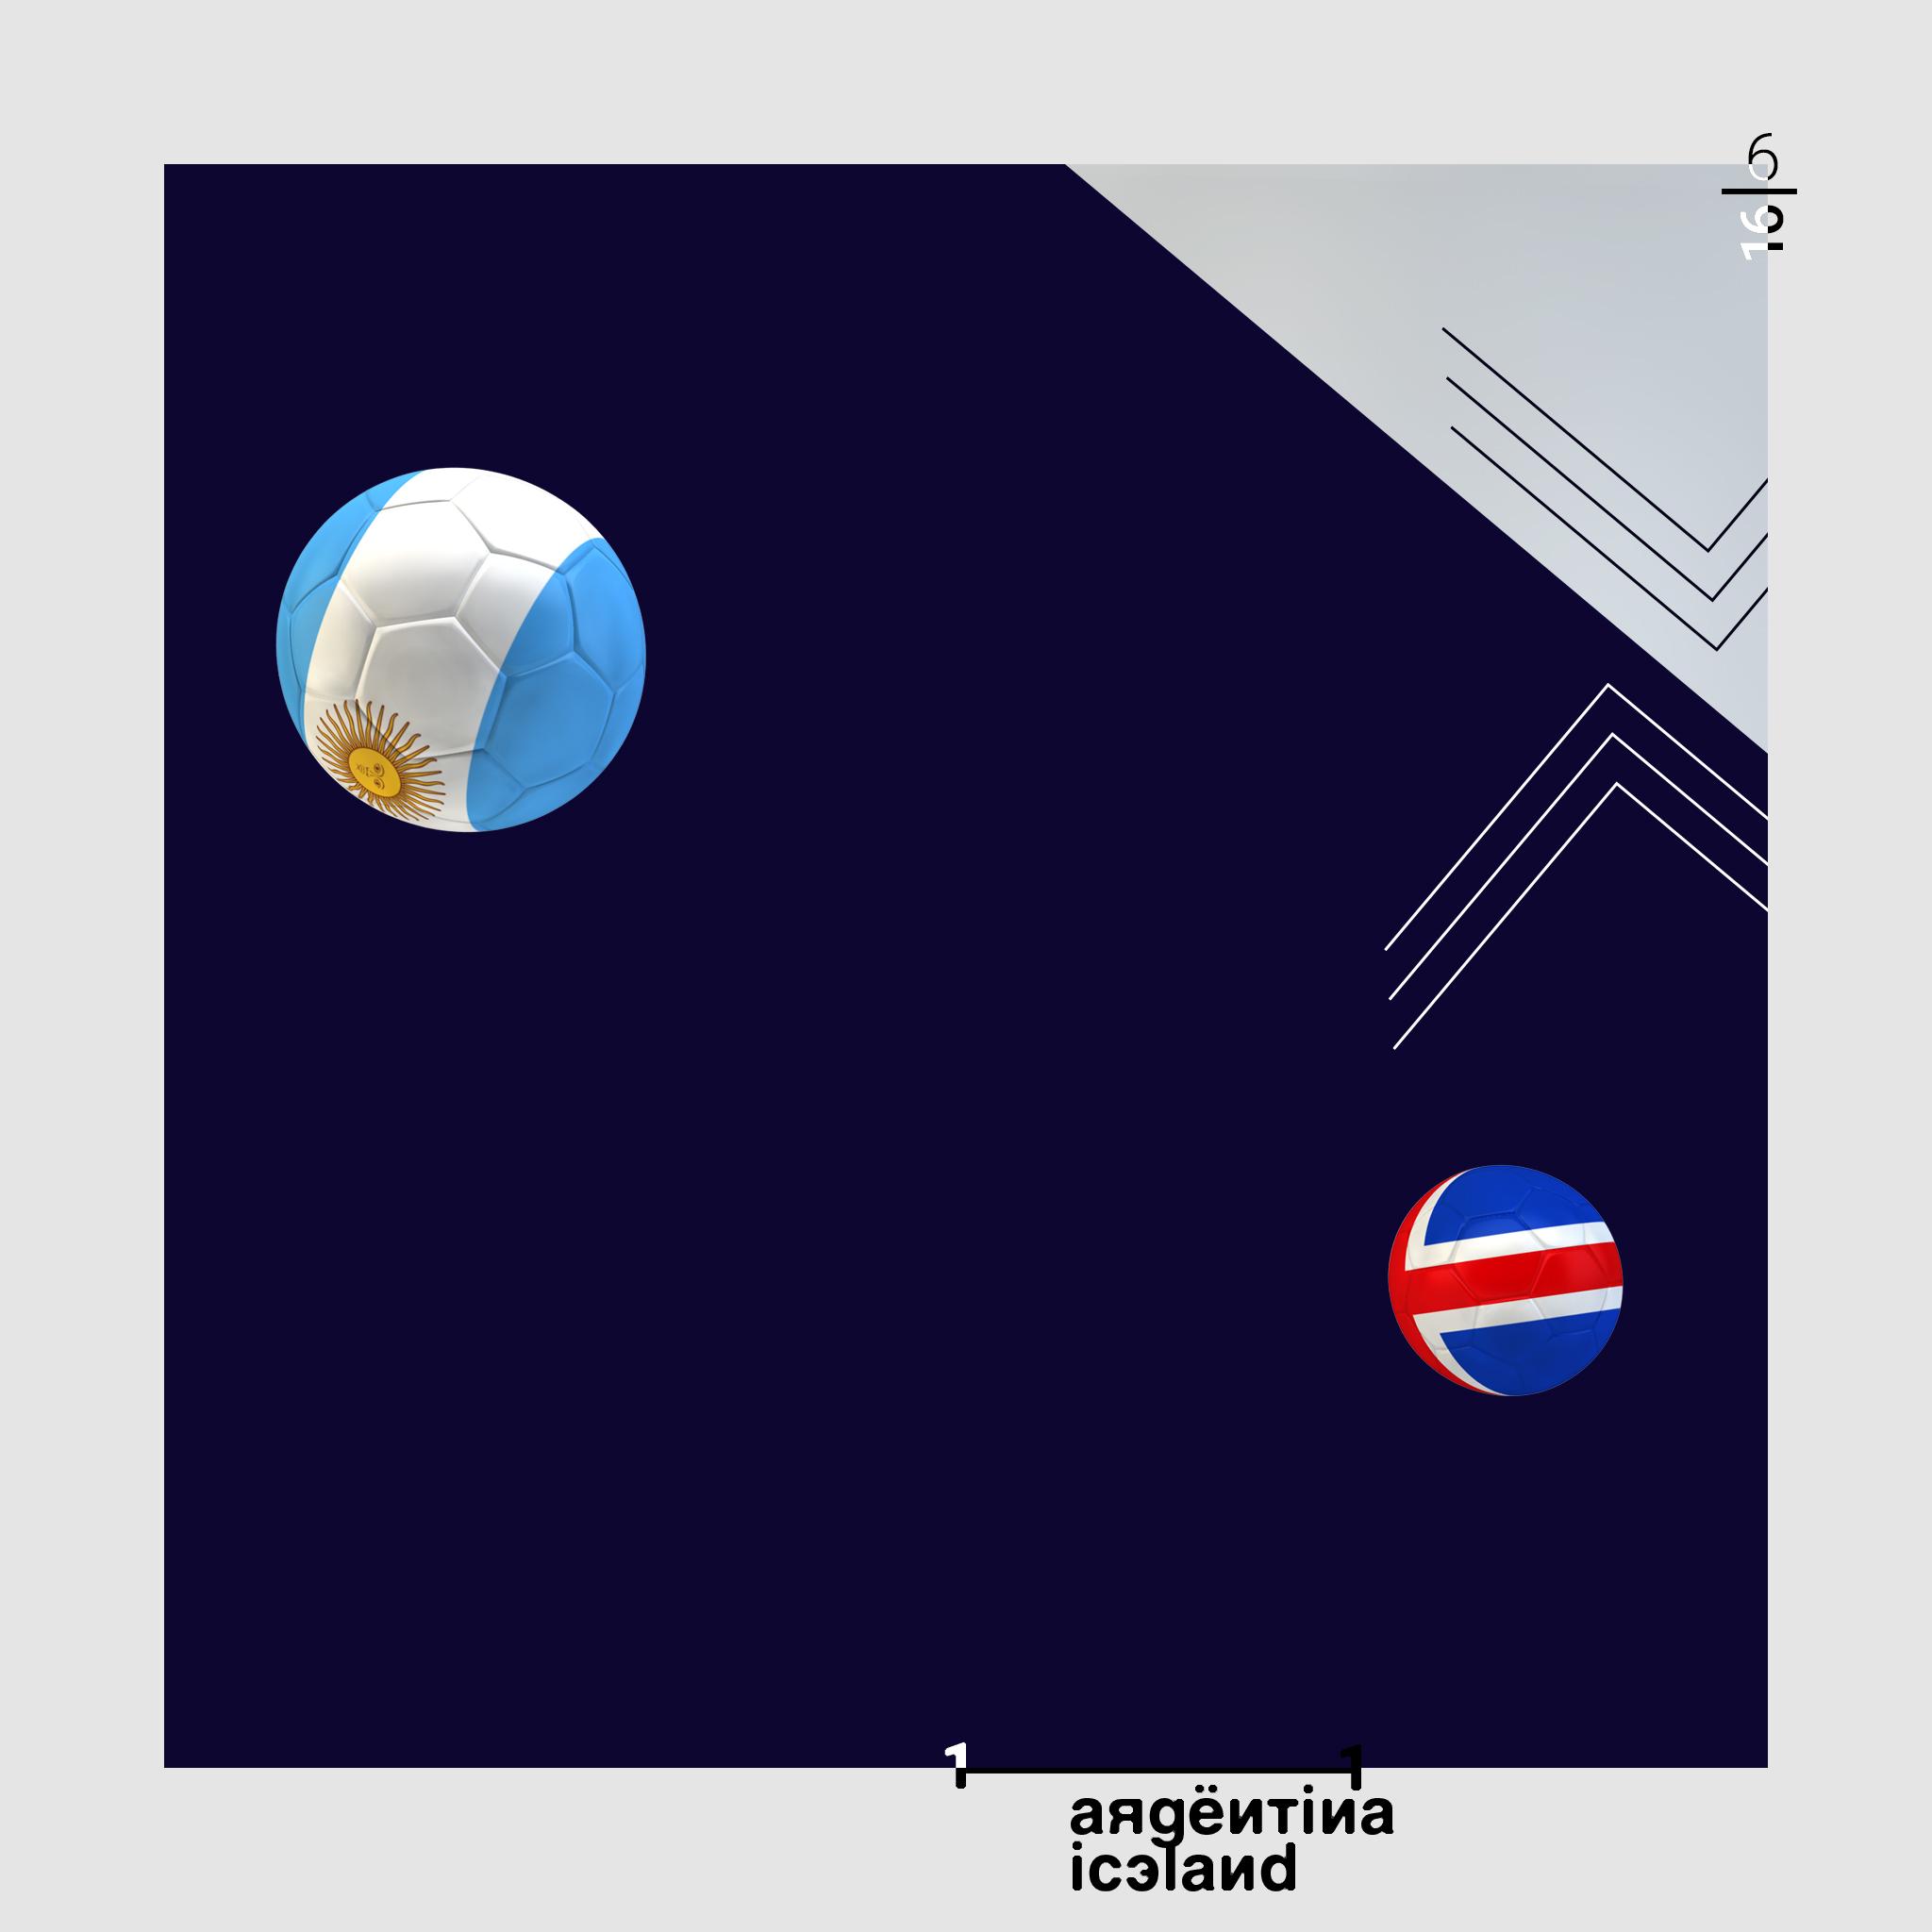 Argentina_Iceland.jpg